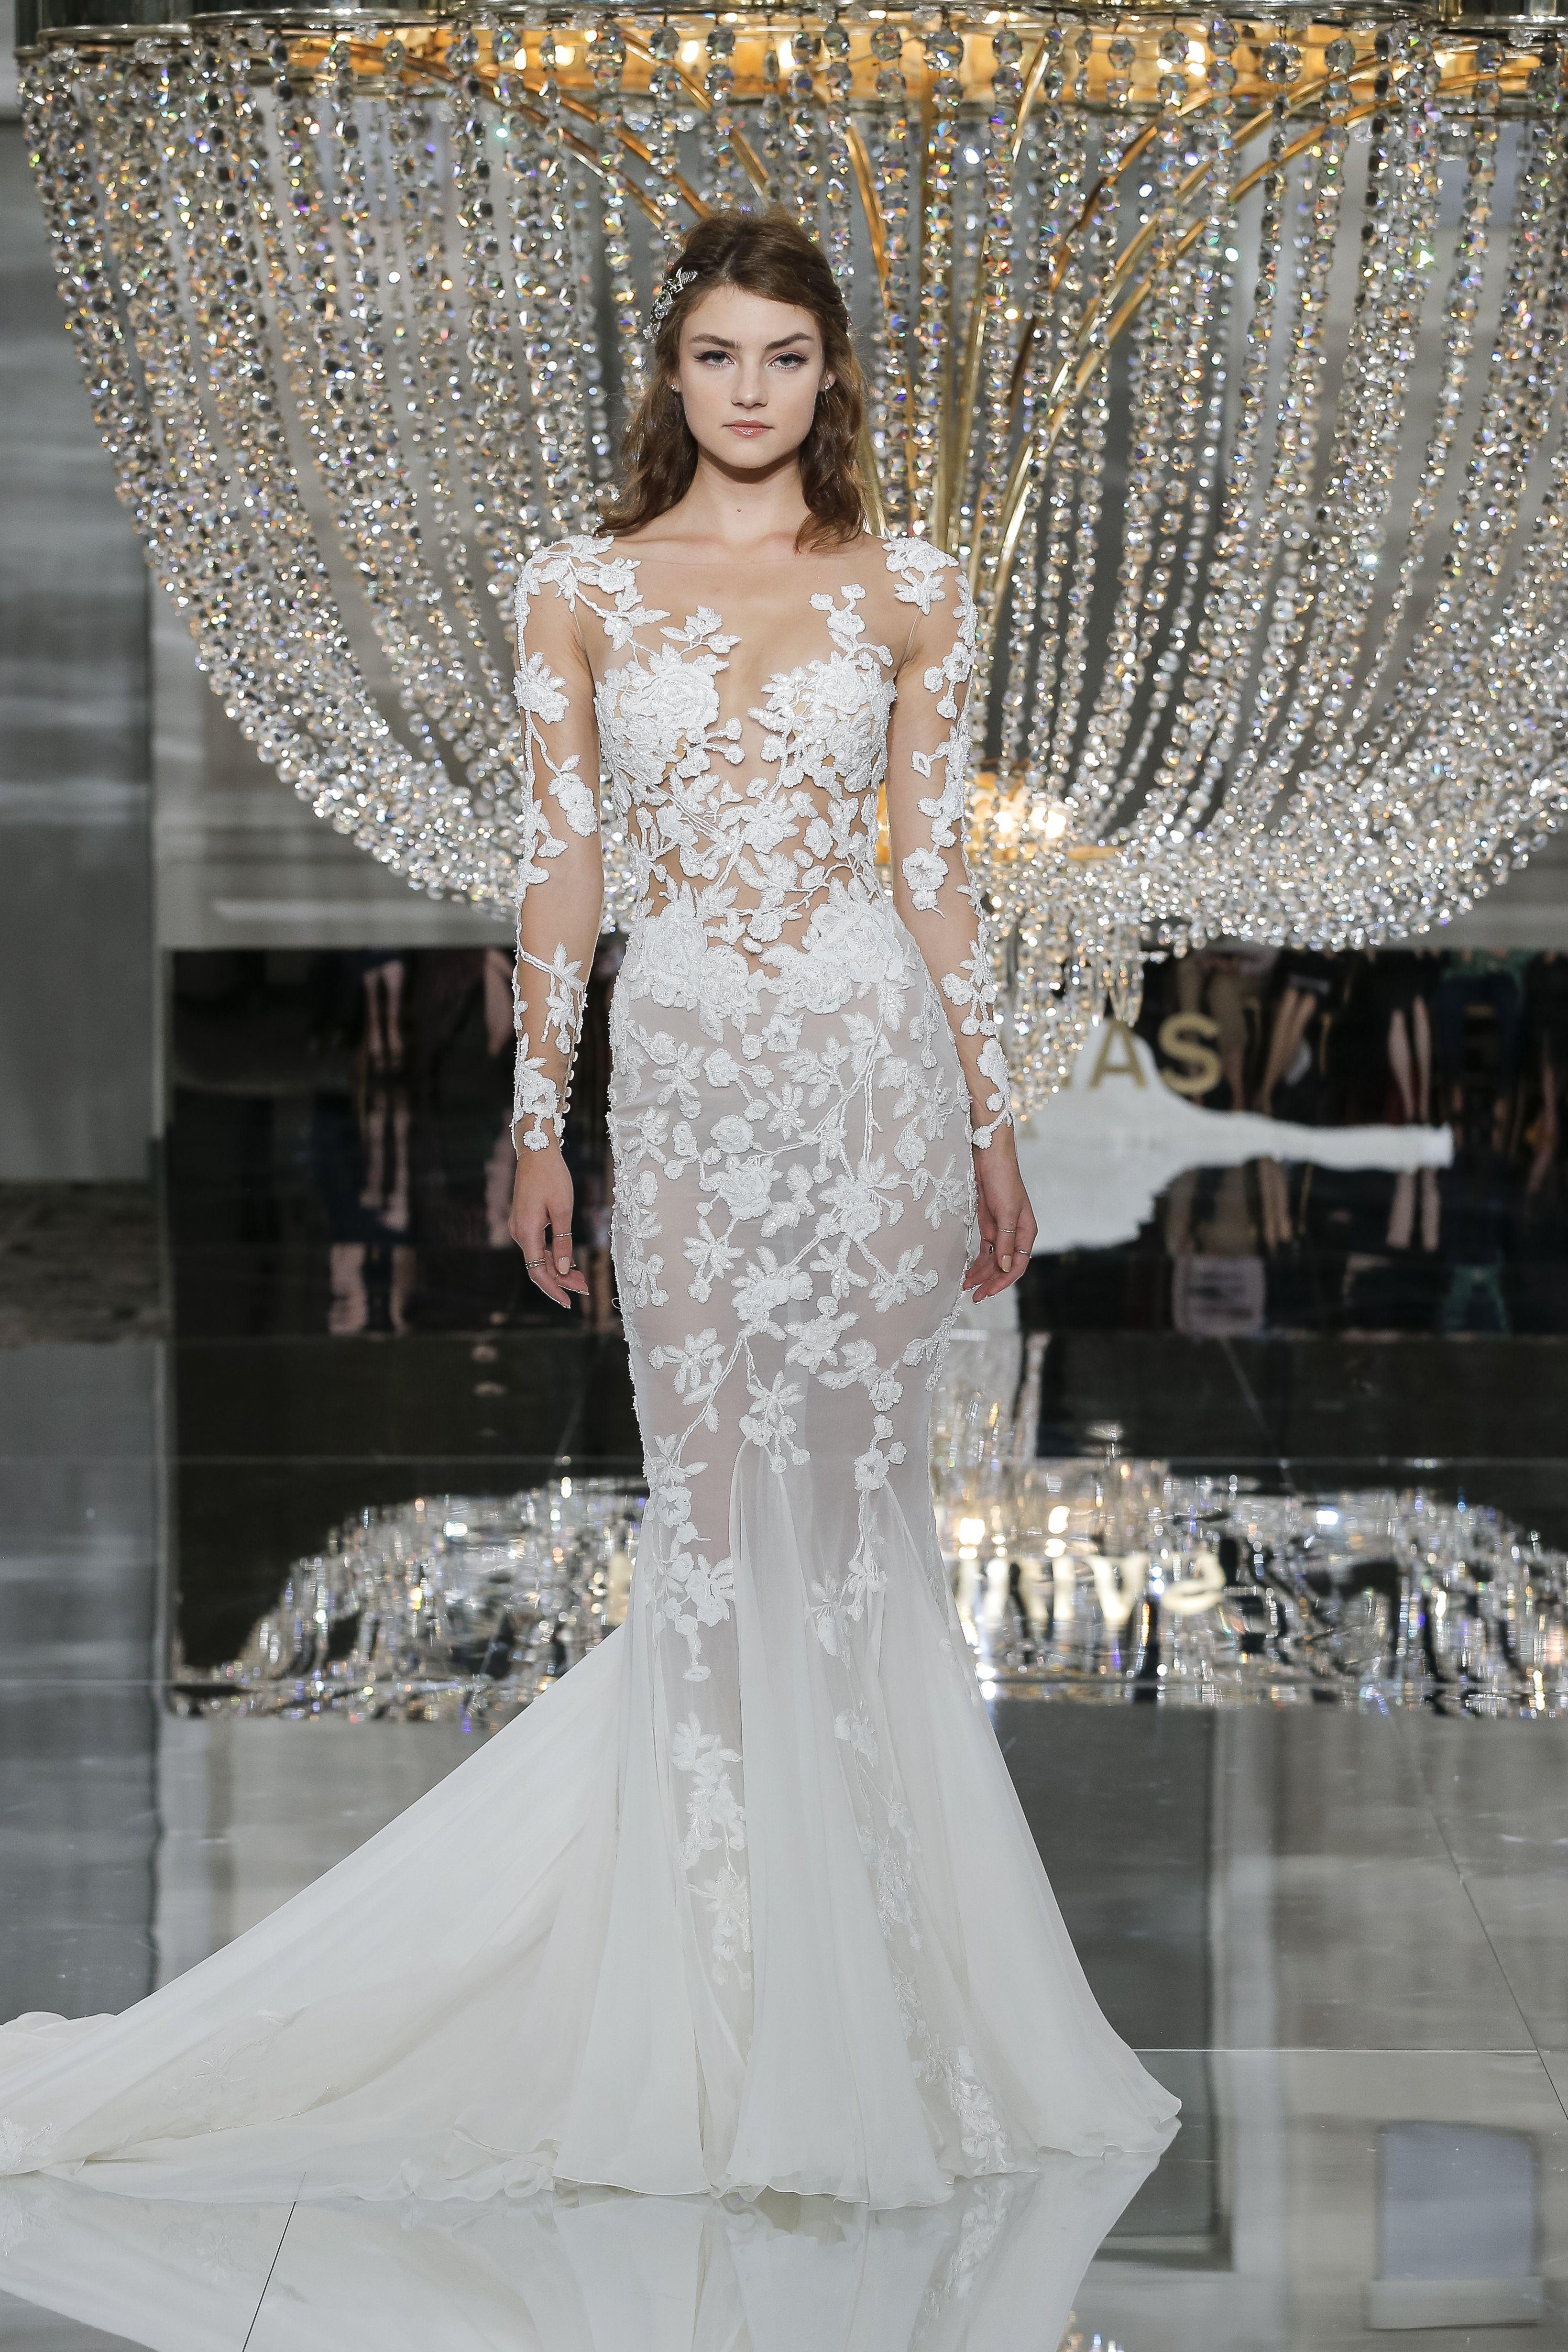 ROCIO Dress From ATELIER PRONOVIAS Pronovias Wedding